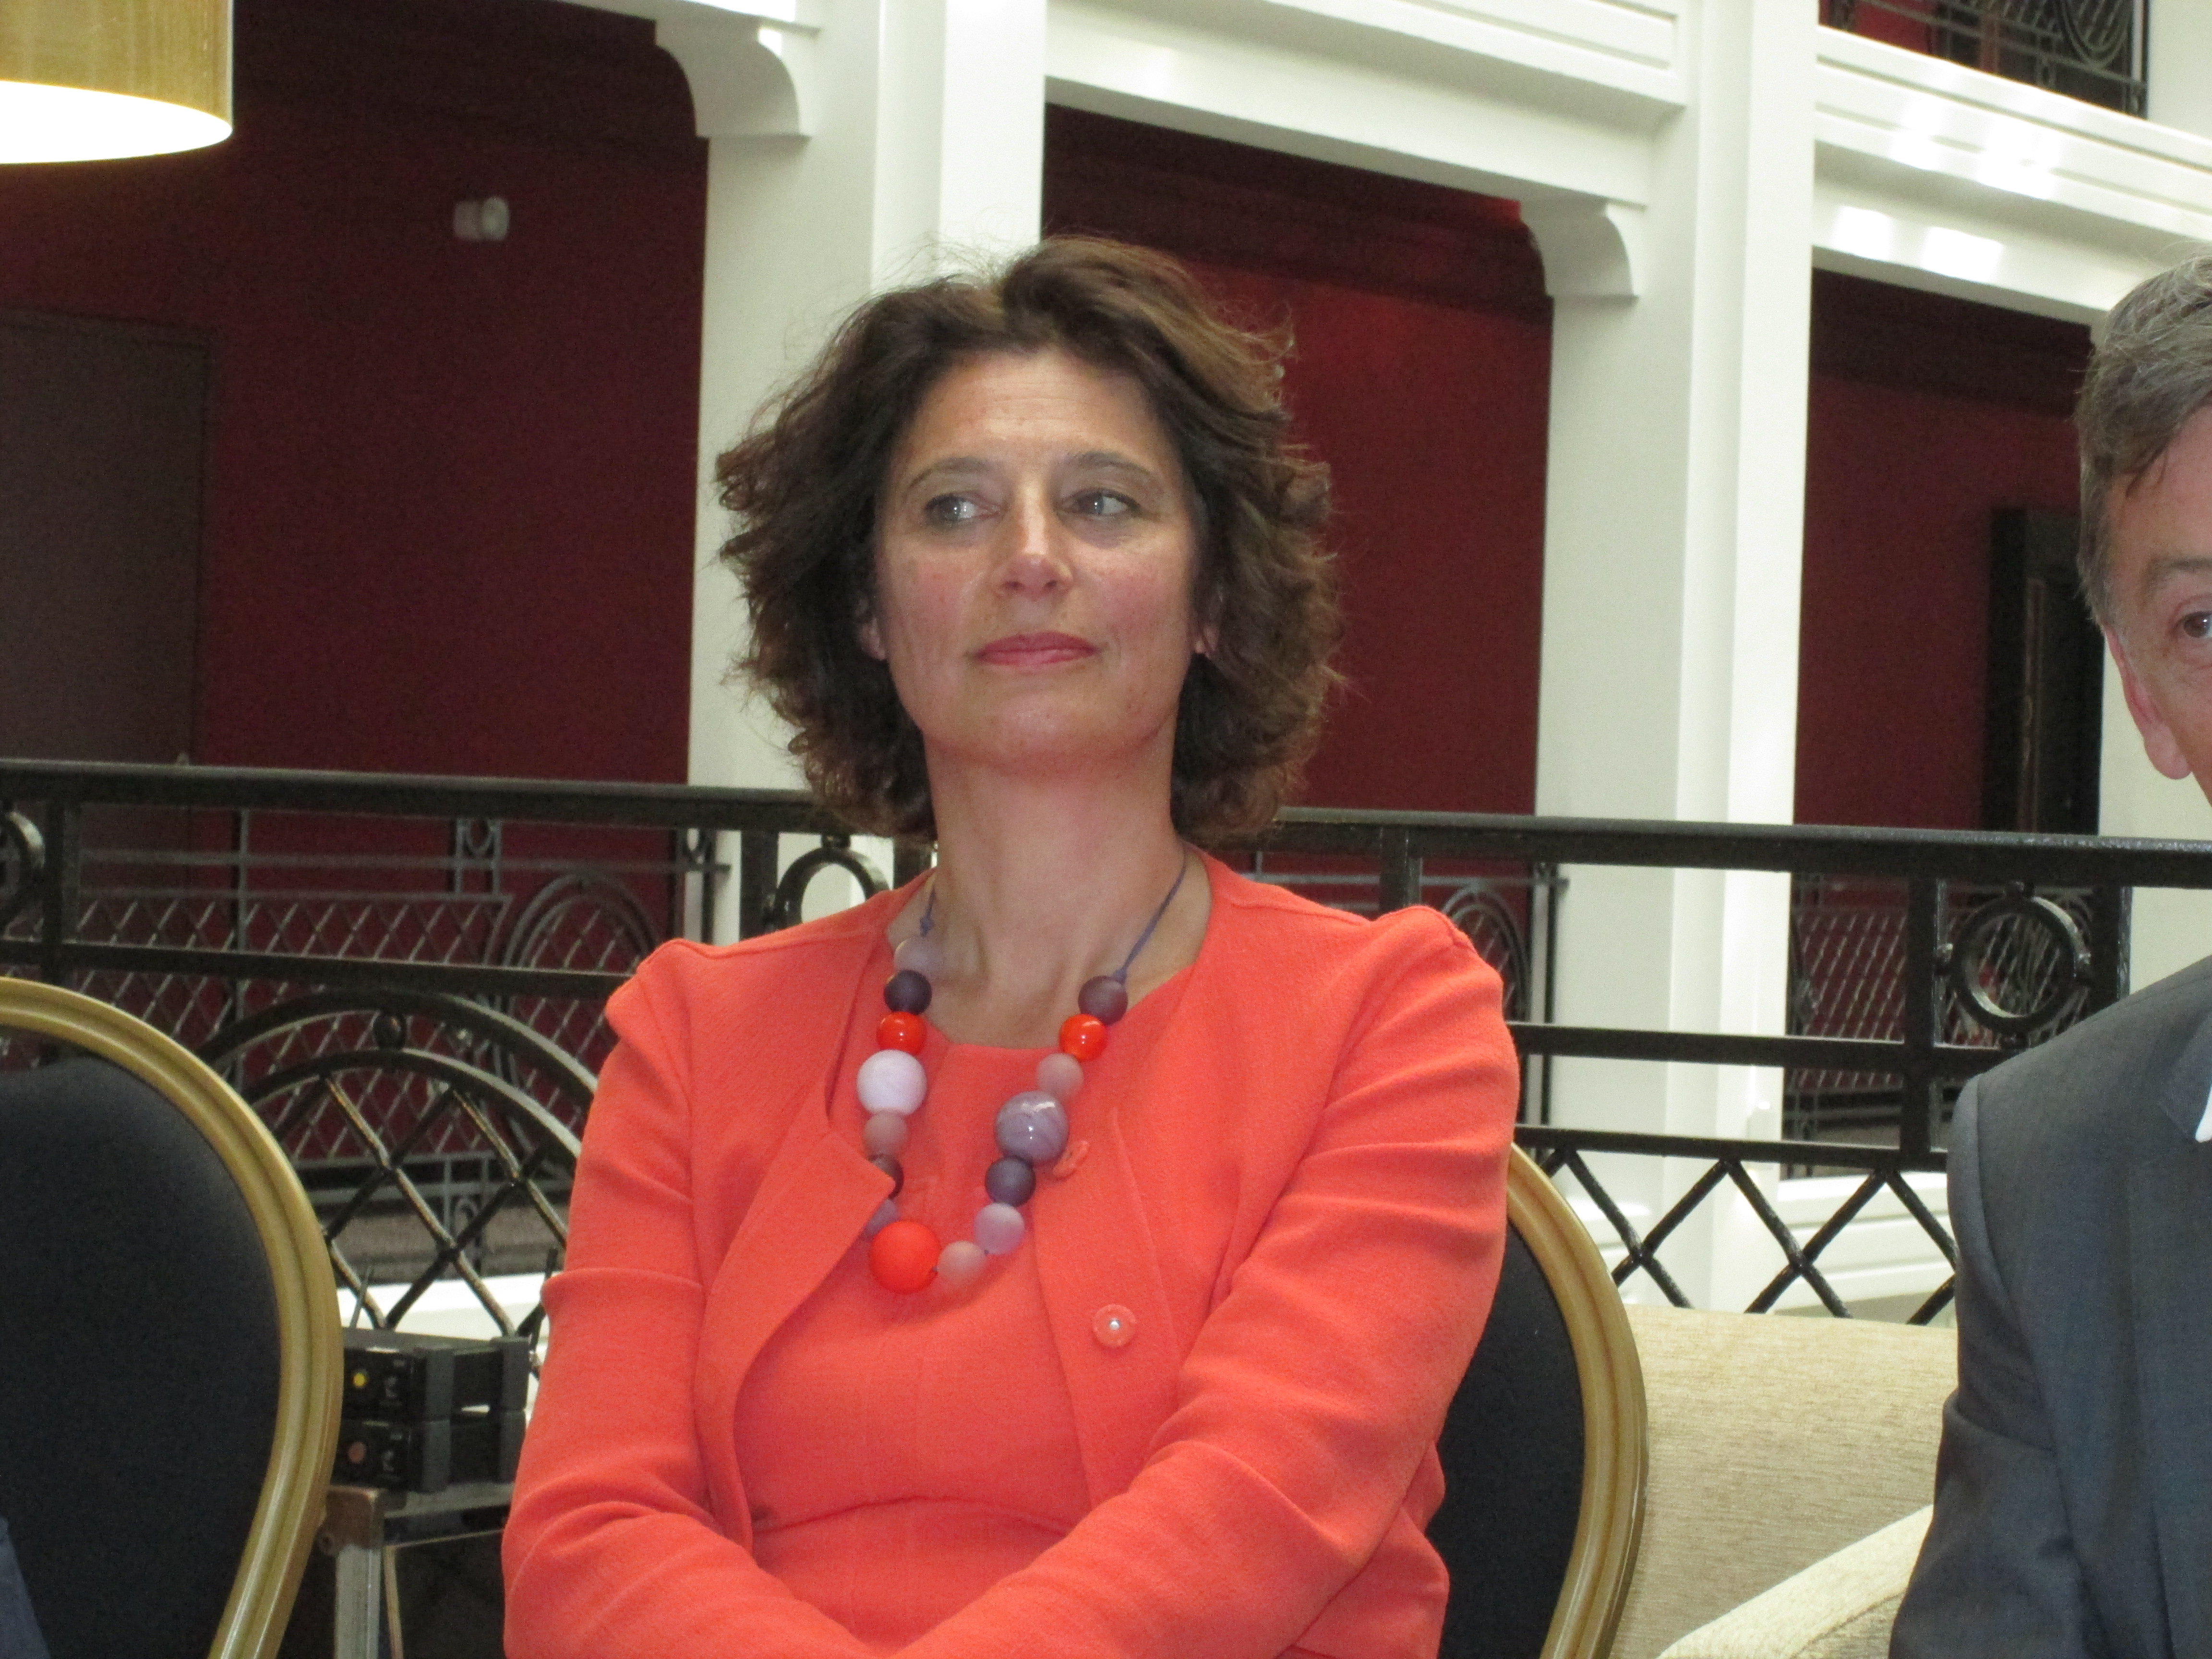 Joëlle Guillemot créatrice de la marque Omnisens. Photographiée ici au MGallery Regina Biarritz Hotel & Spa.